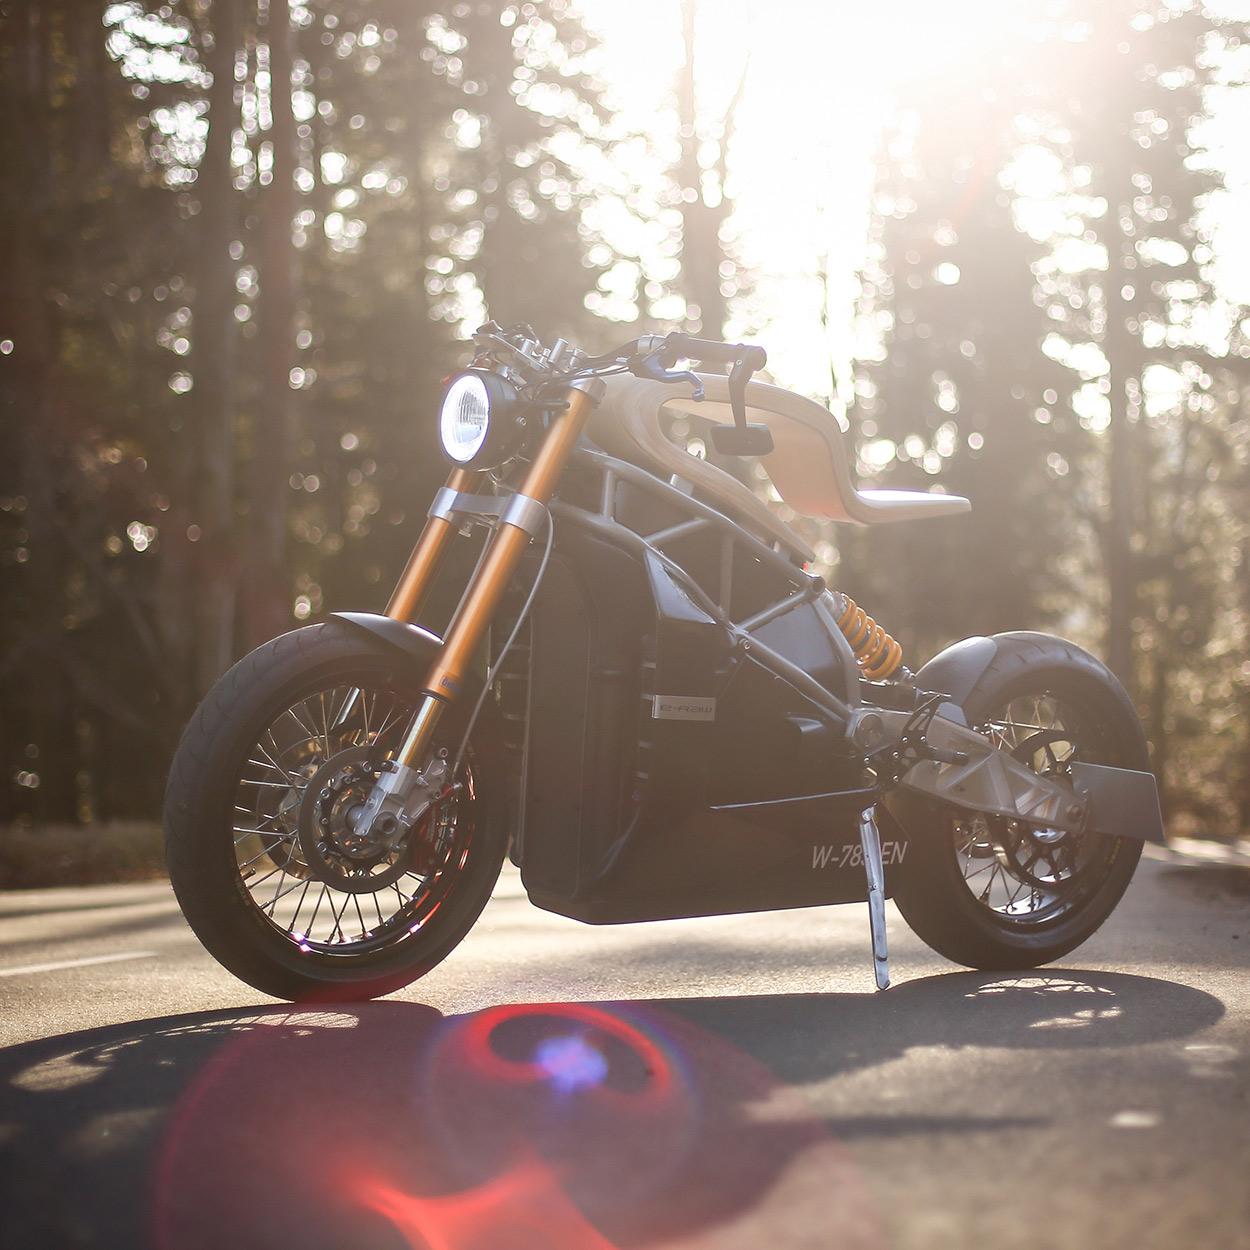 http://kickstart.bikeexif.com/wp-content/uploads/2017/03/e-raw-french-electric-motorcycle-1.jpg